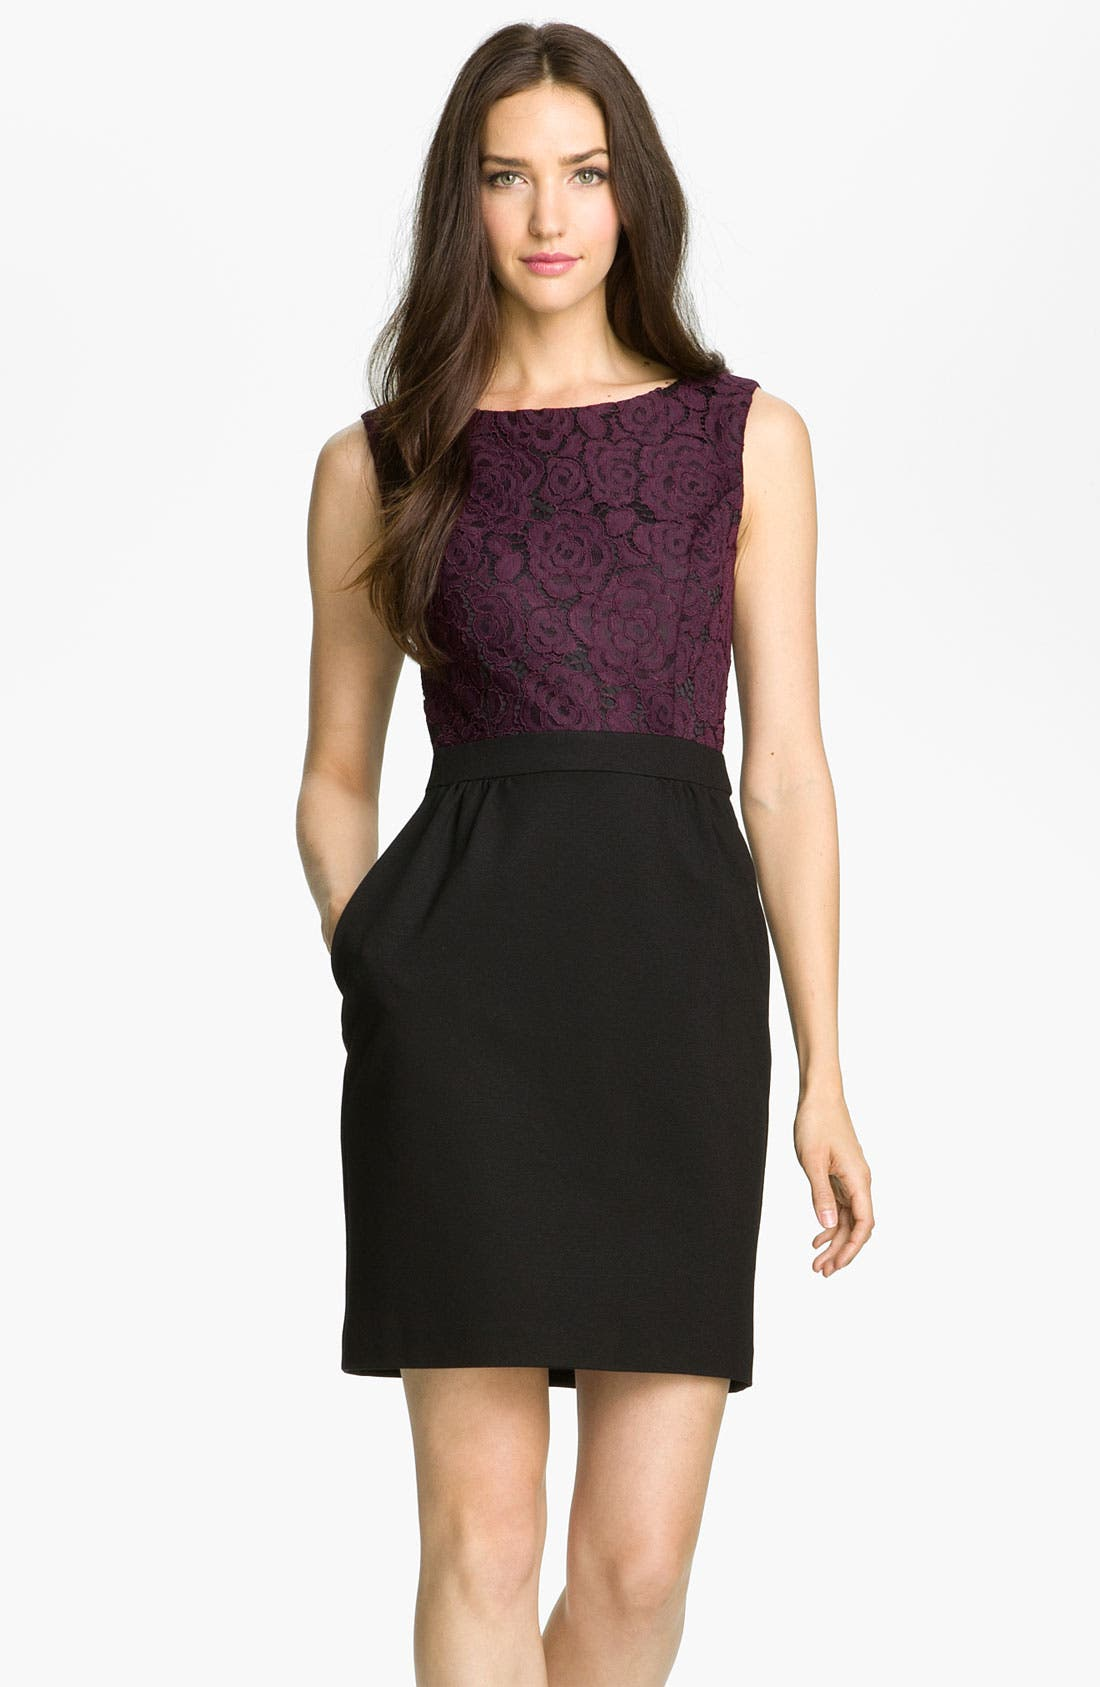 Alternate Image 1 Selected - Trina Turk 'Fable' Lace & Ponte Sheath Dress